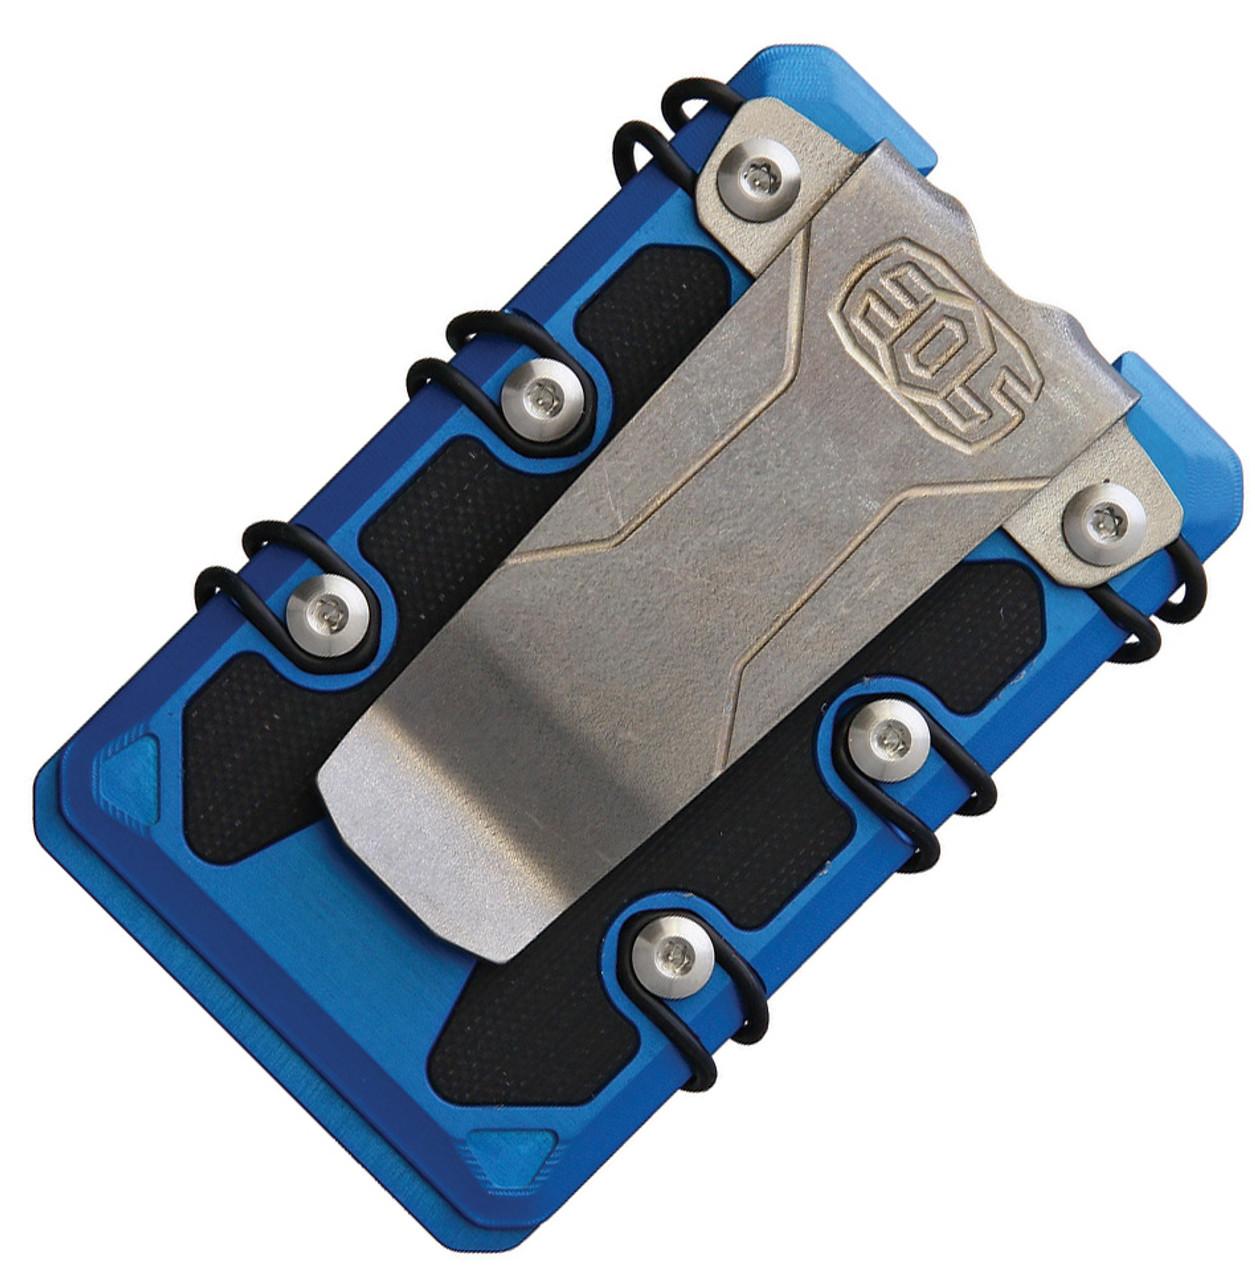 EOS 3.0 Lite Wallet EOS071, Blue Aluminum Construction, Silver Anodized Hardware